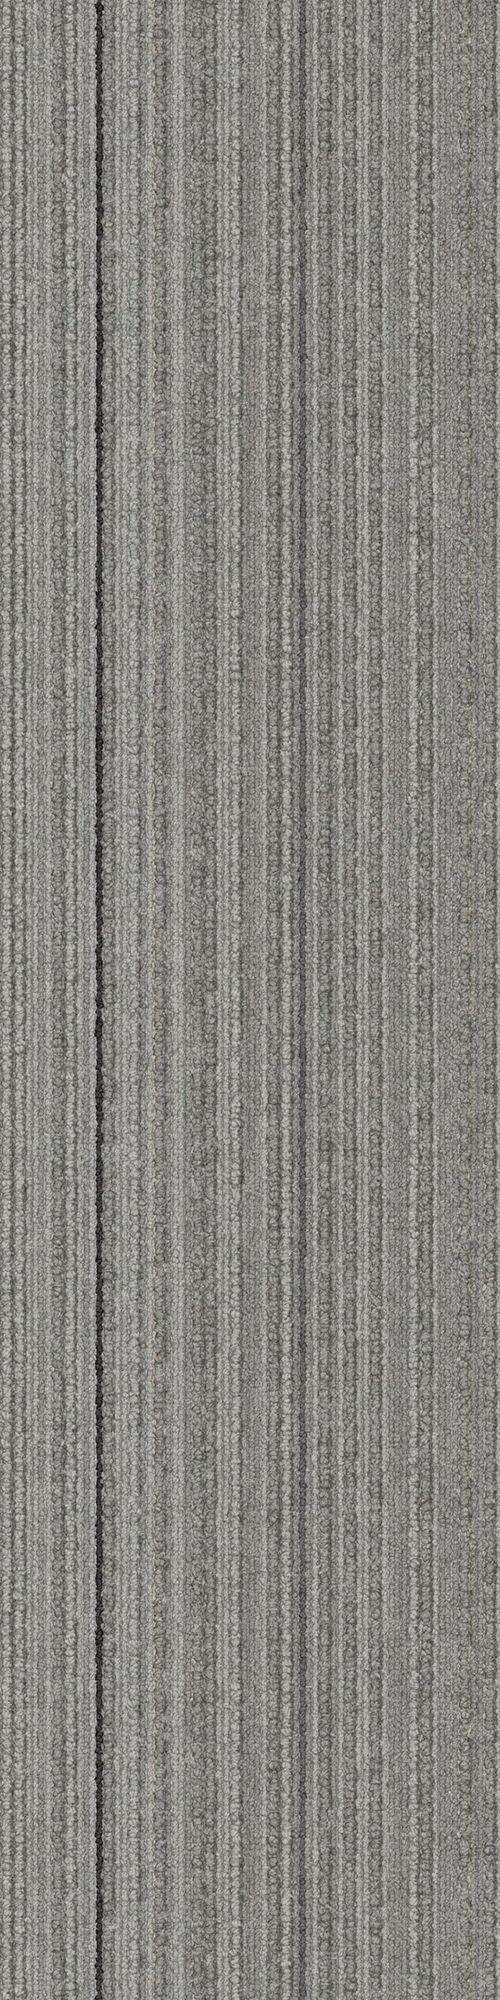 Interface carpet tile: SL920 Color name: Grey Line